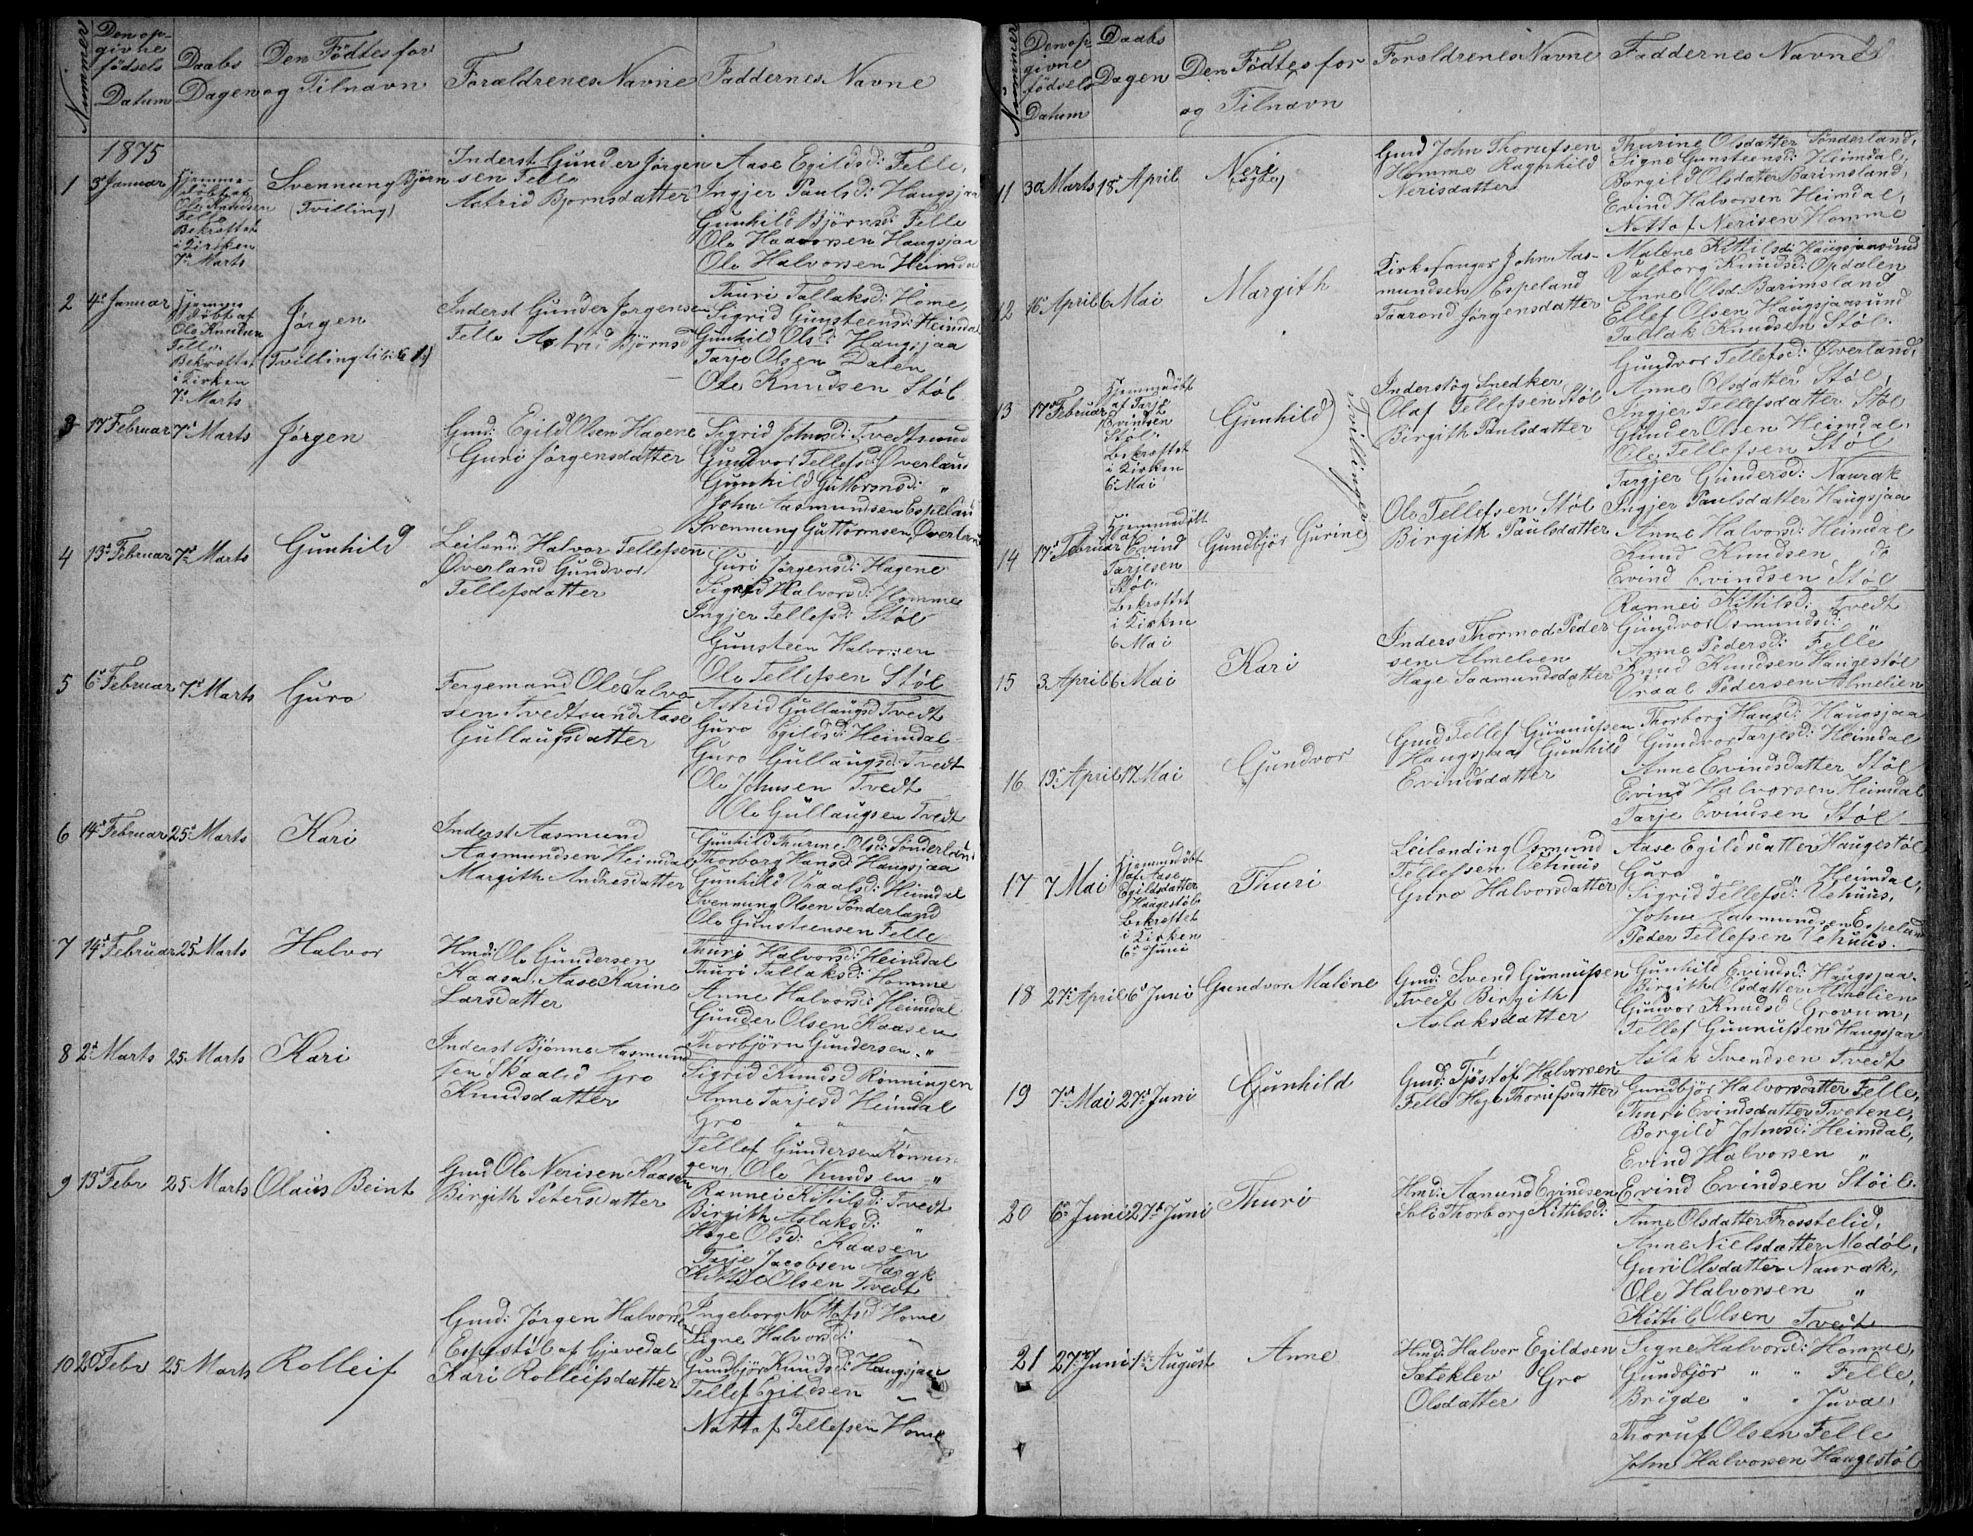 SAKO, Nissedal kirkebøker, G/Gb/L0002: Klokkerbok nr. II 2, 1863-1892, s. 20